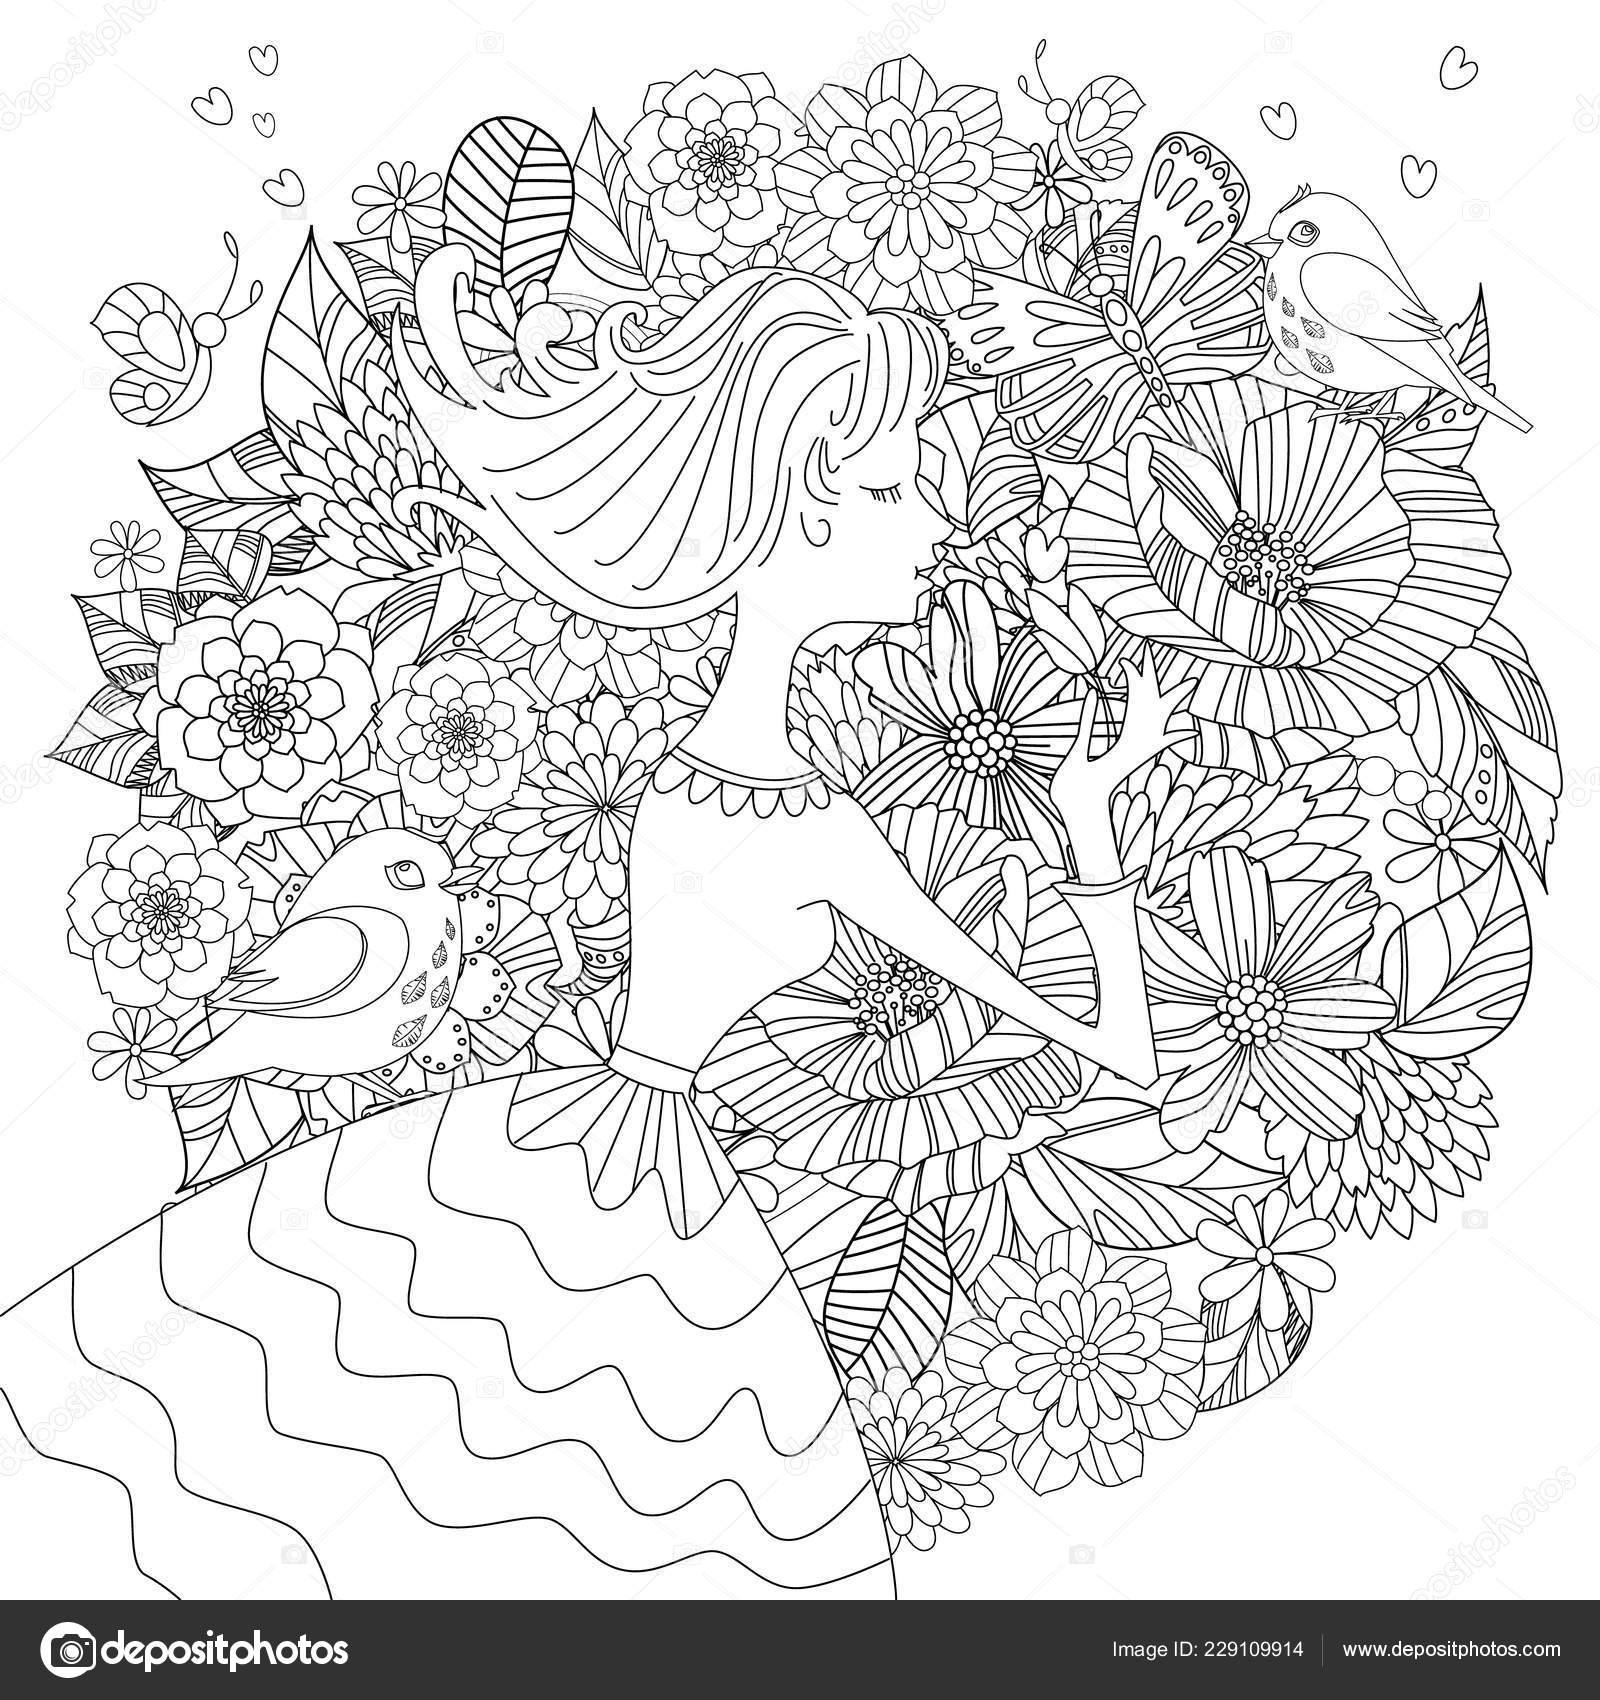 Fancy Pretty Girl Flowers Birds Your Coloring Book Stock Vector C Oksana 229109914